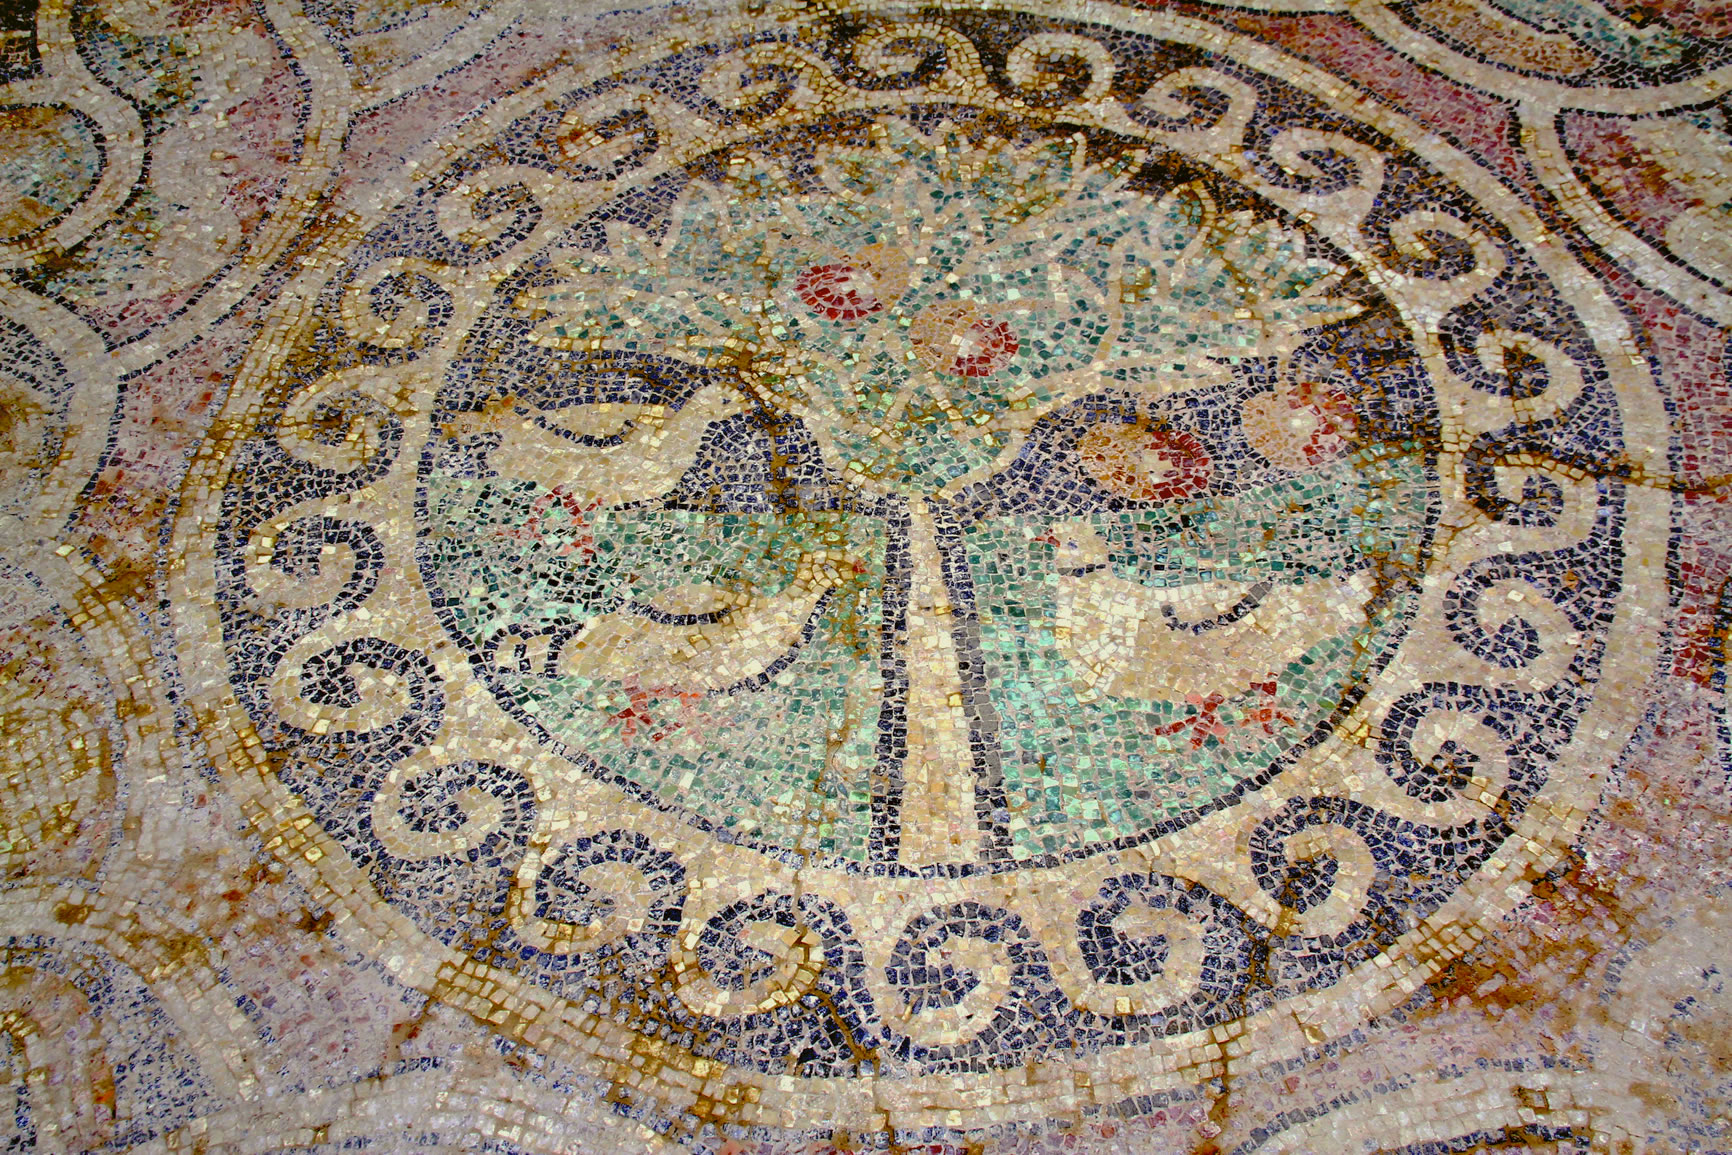 Doves in Yavru mosaic